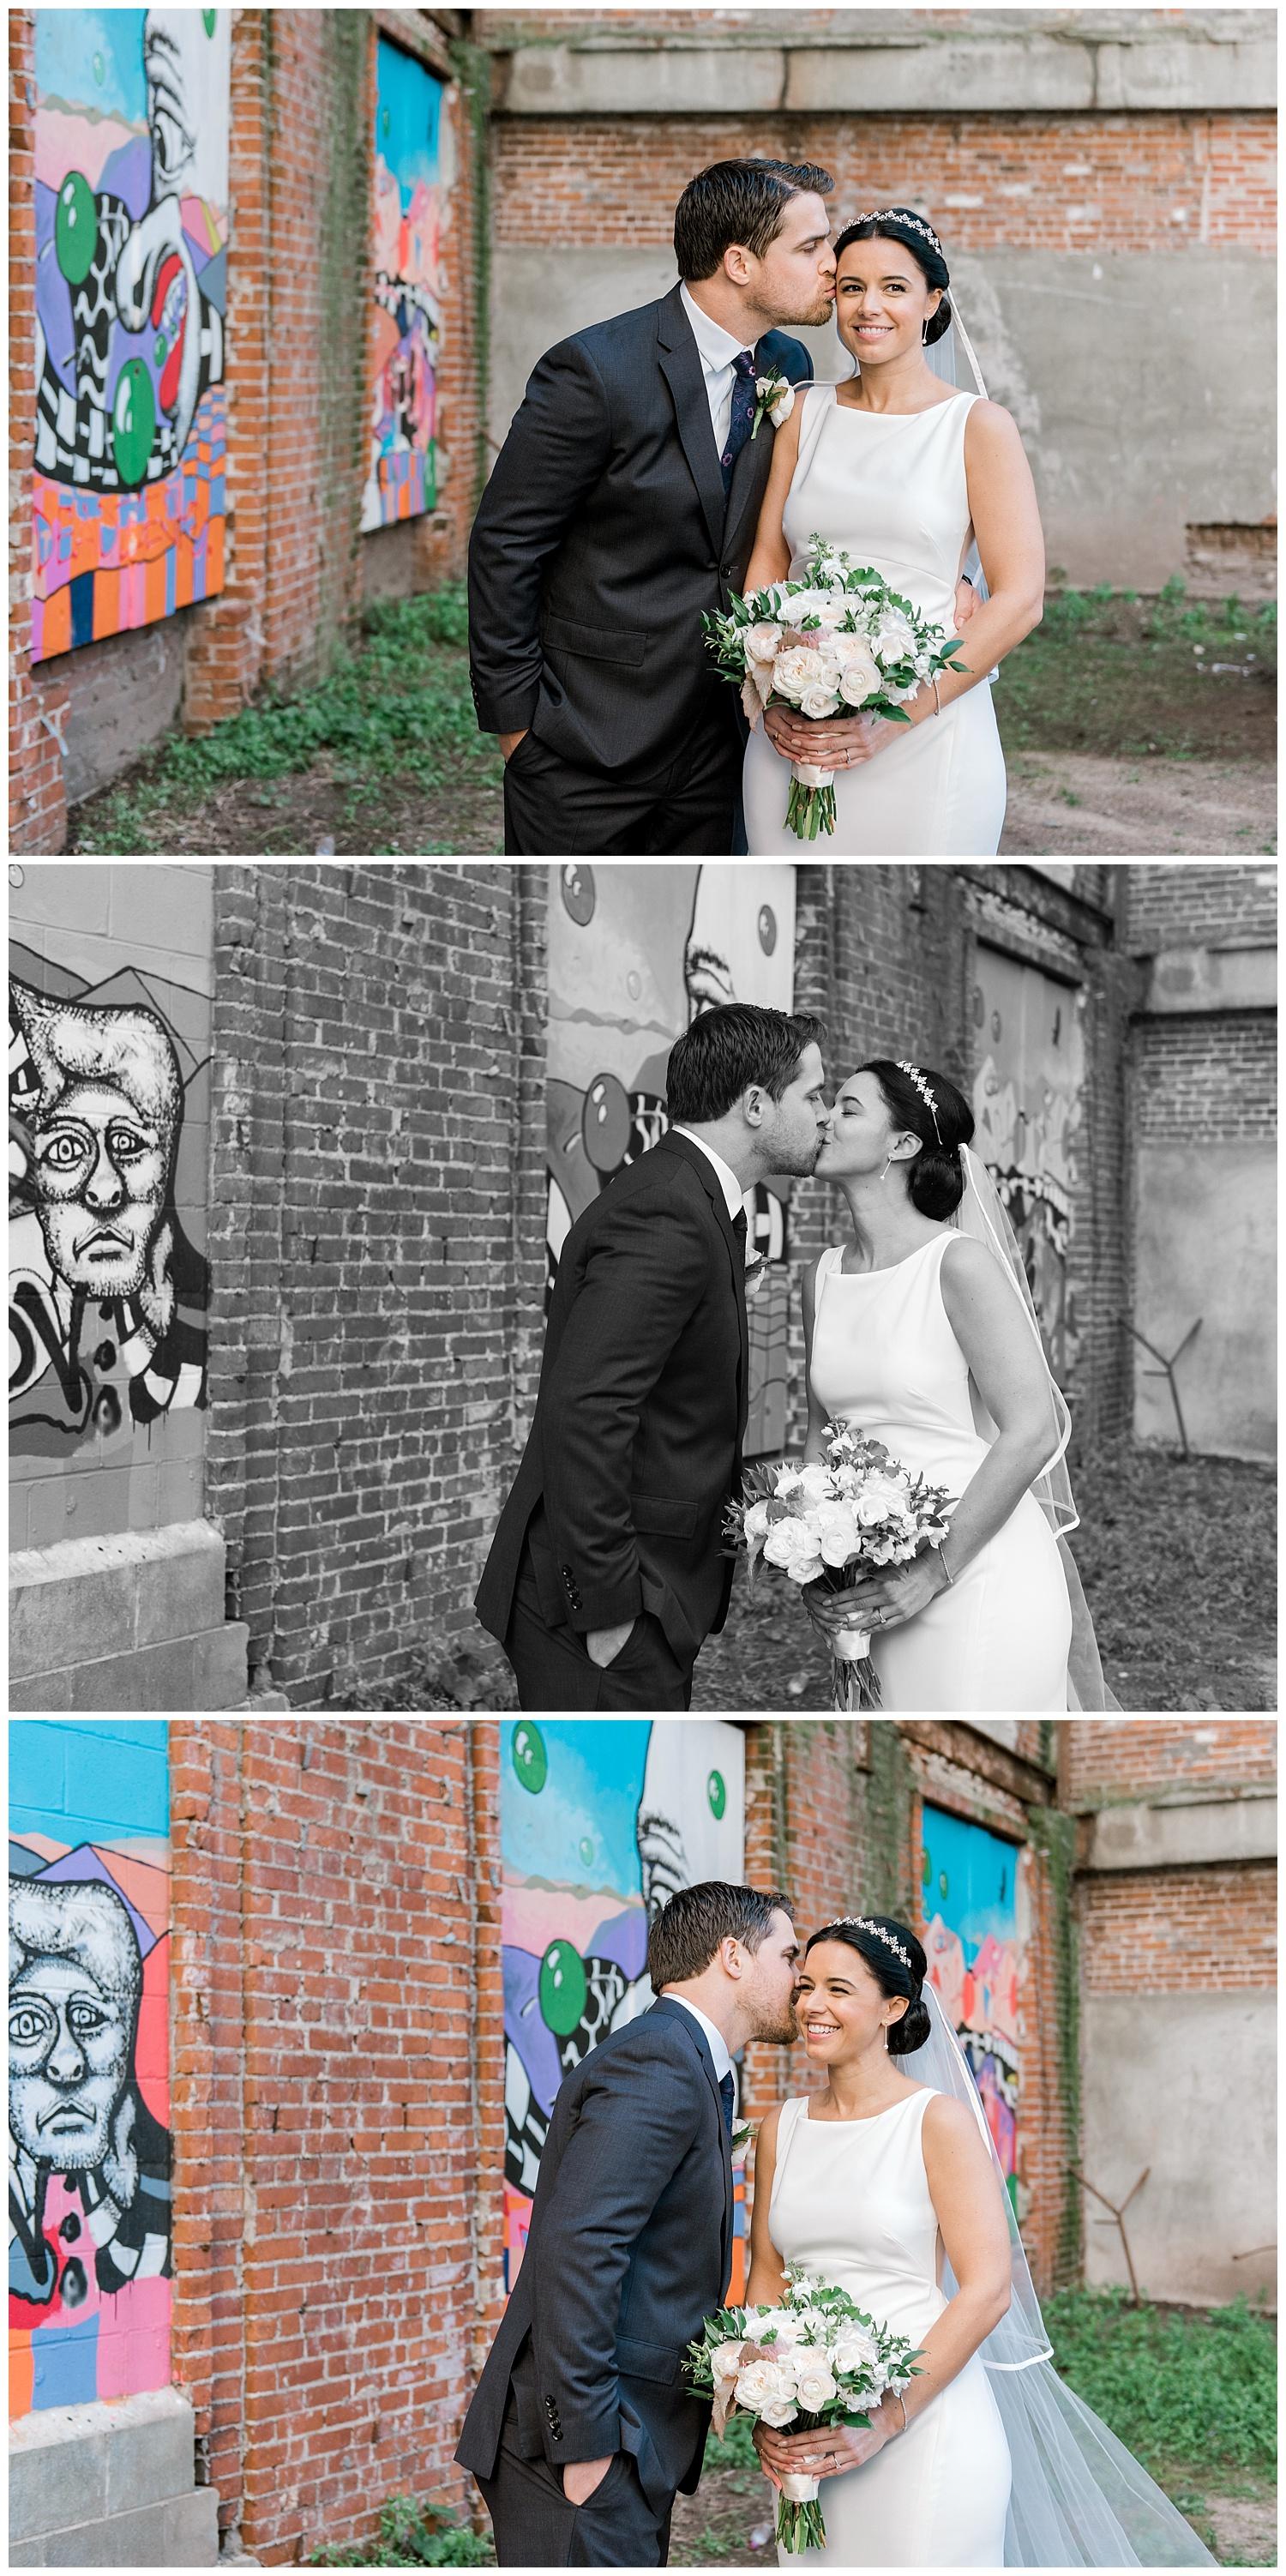 the-dorrance-providence-wedding-photography-october19-photo-10.jpg